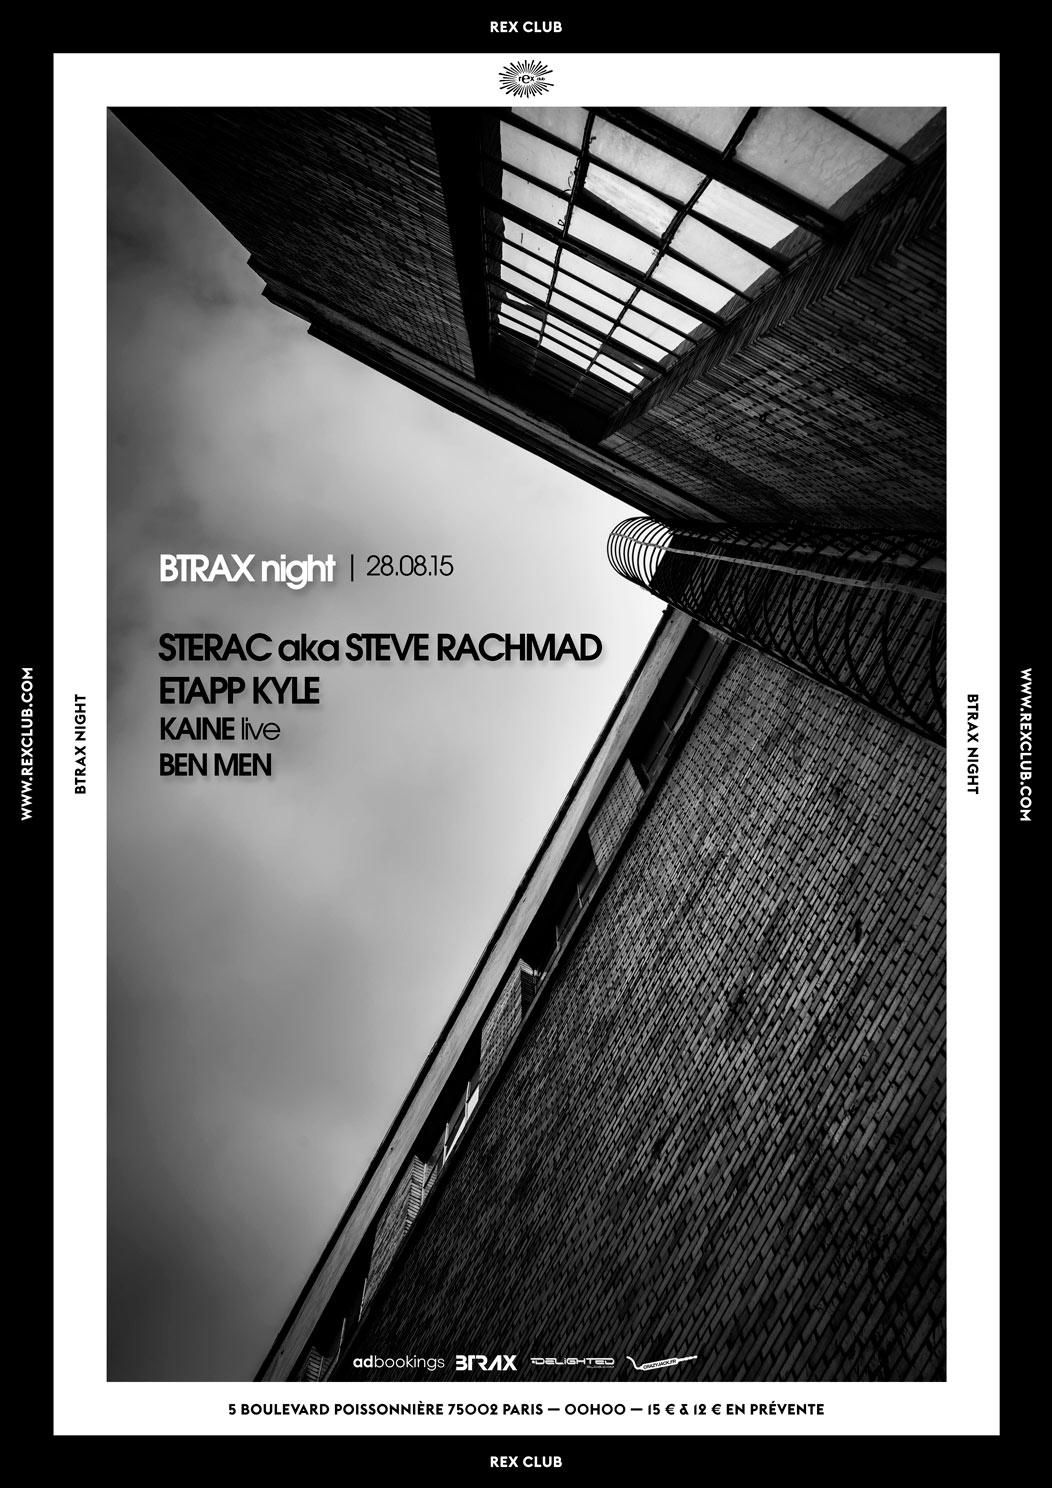 btrax-night-poster-20150828